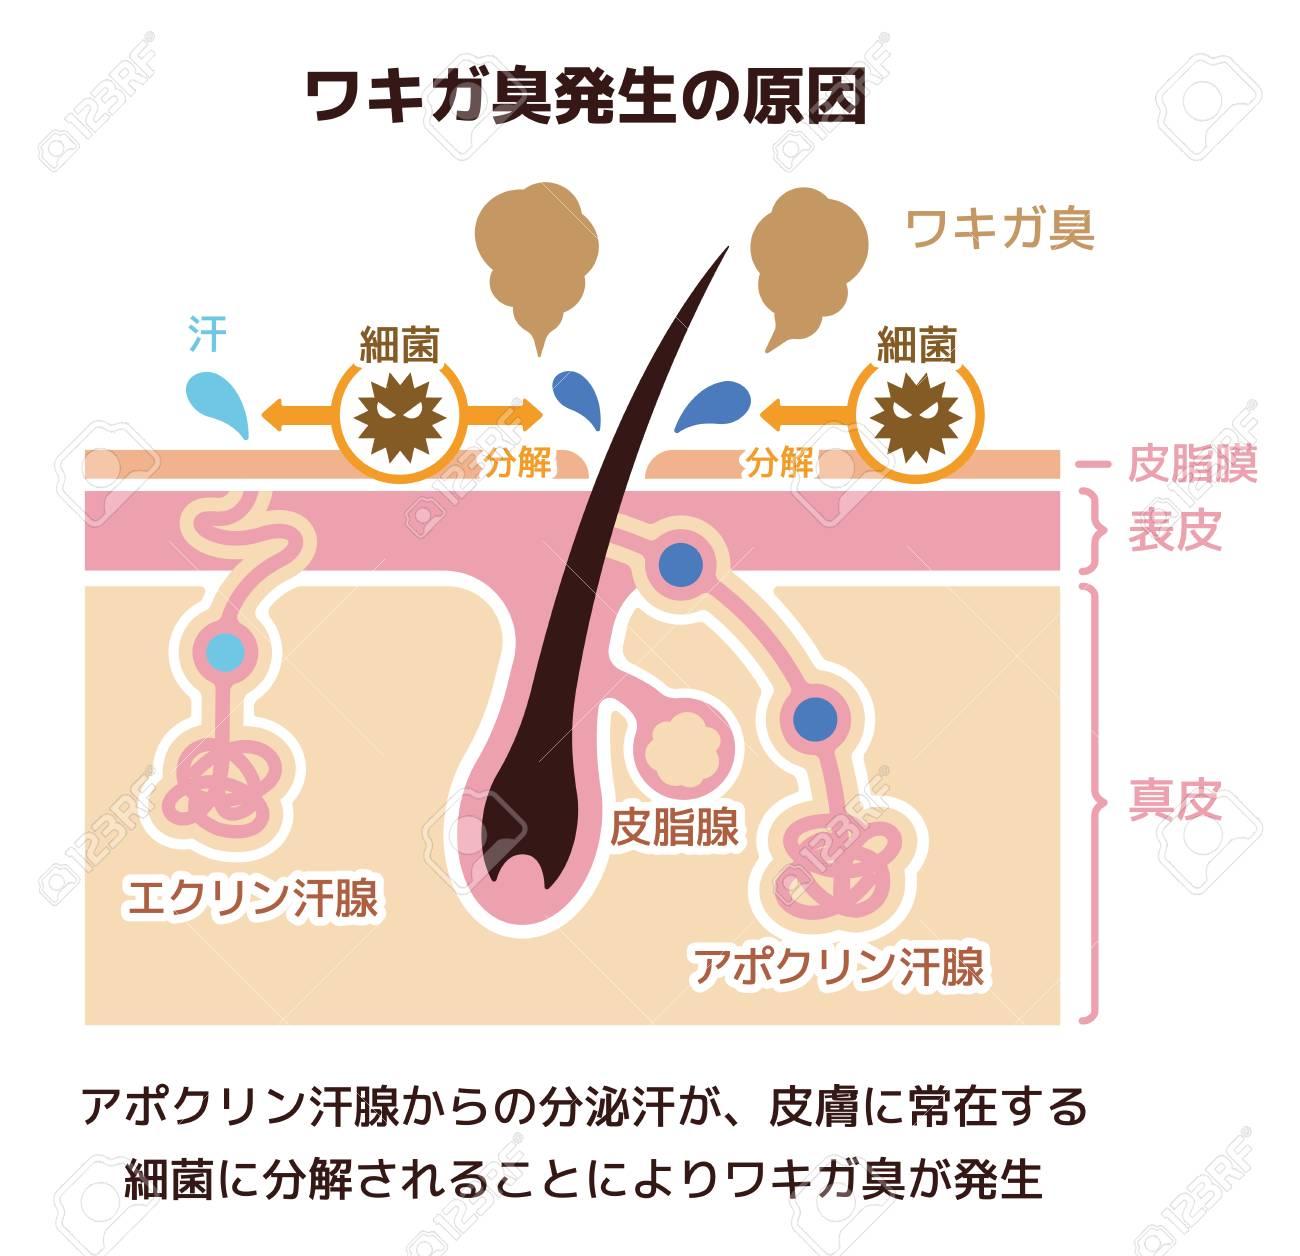 Cause of body odor illustration (Japanese)